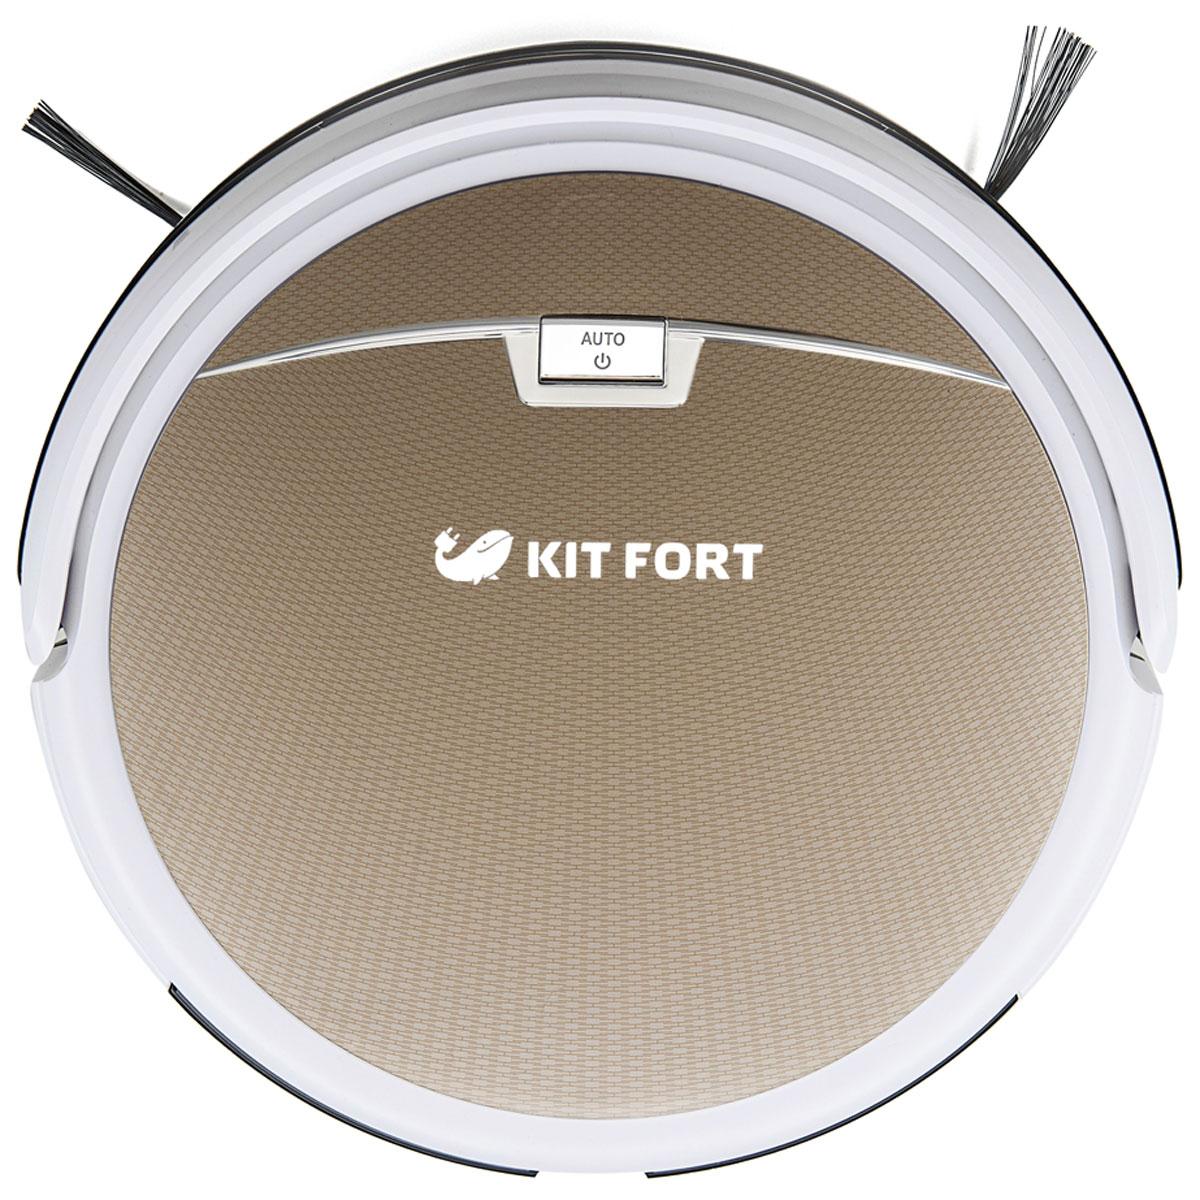 Kitfort KT-519-3, Gold робот-пылесос